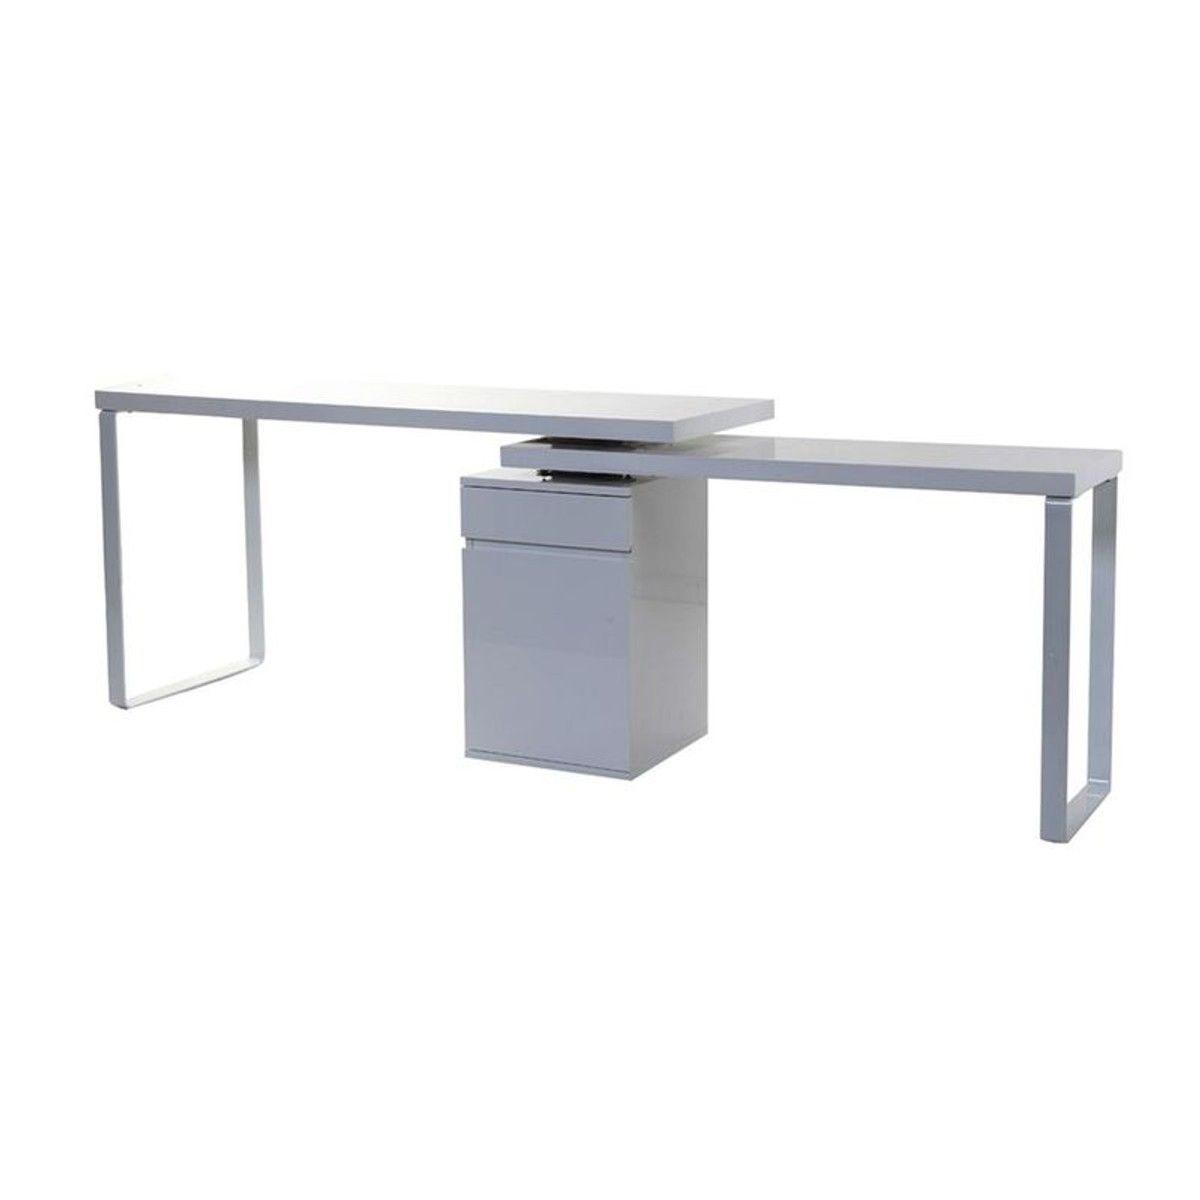 Bureau Design Amovible Blanc Brillant Voxy Taille Tu Bureau Design Bureau Amovible Chaise De Bureau Design